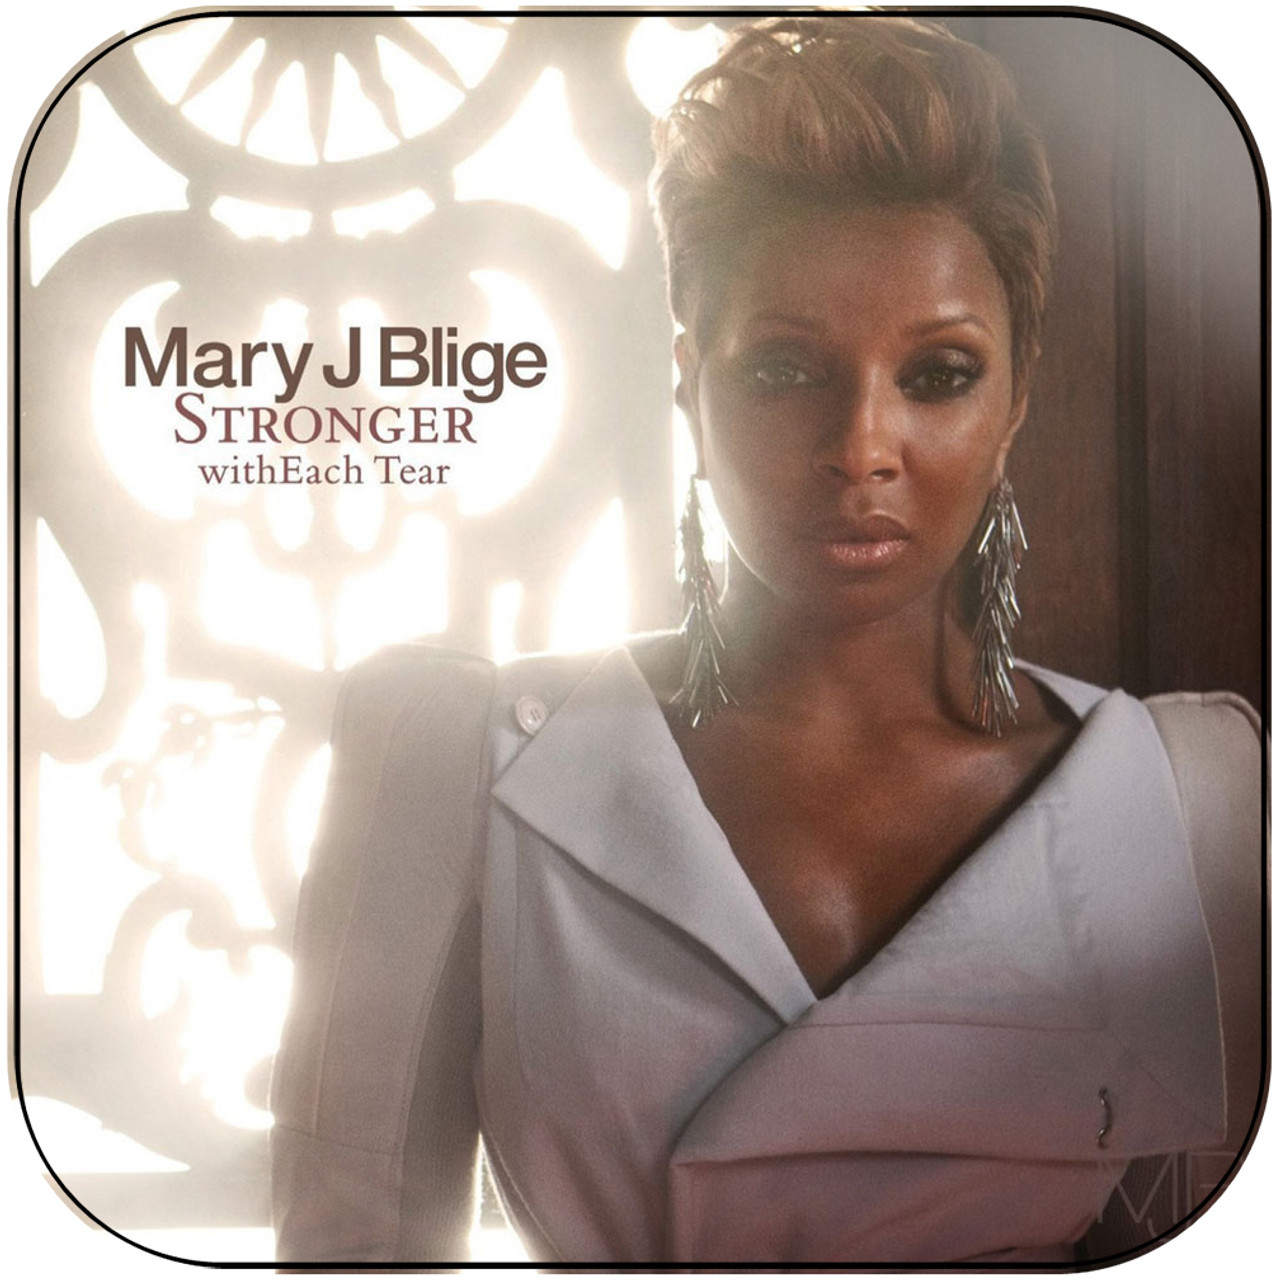 Mary J Blige - The Breakthrough Album Cover Sticker Album Cover Sticker